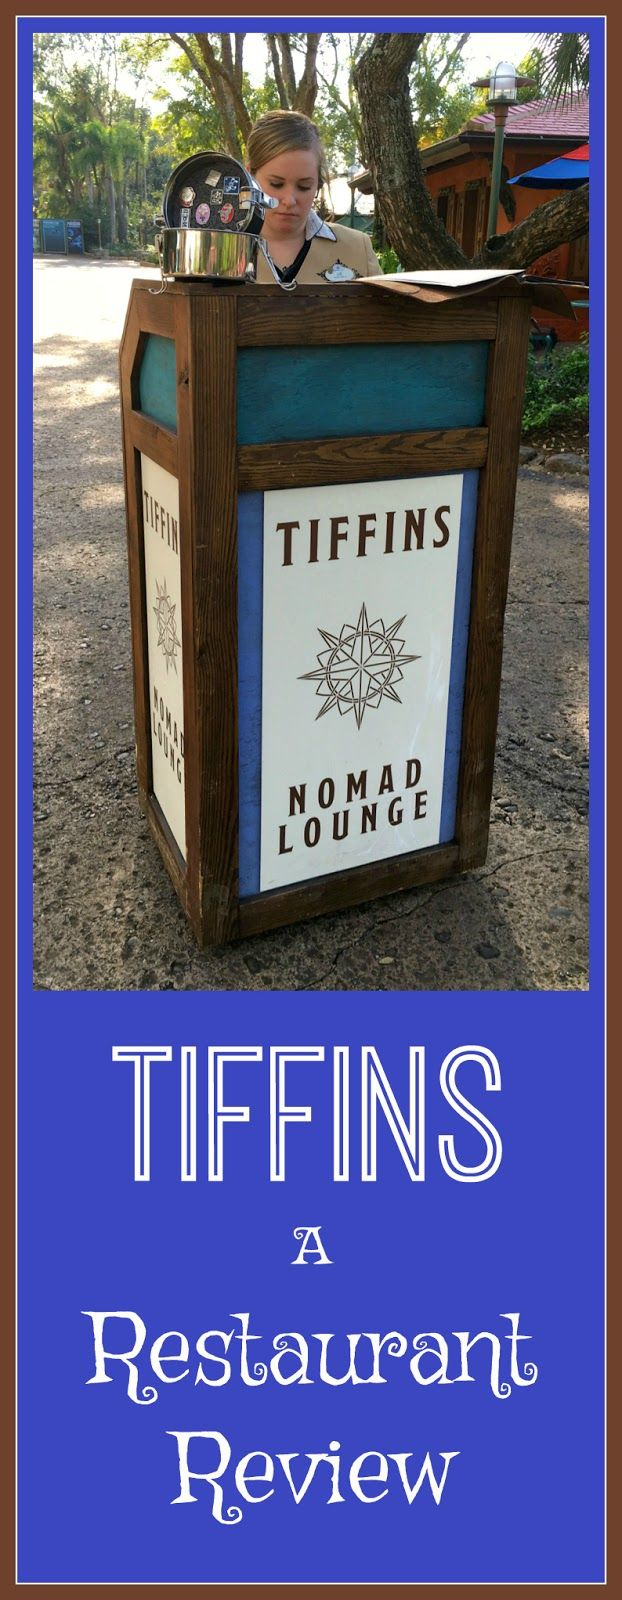 A Tiffins Restaurant Review | Romance In the Wild | Disney's Animal Kingdom Park | Walt Disney World Resort